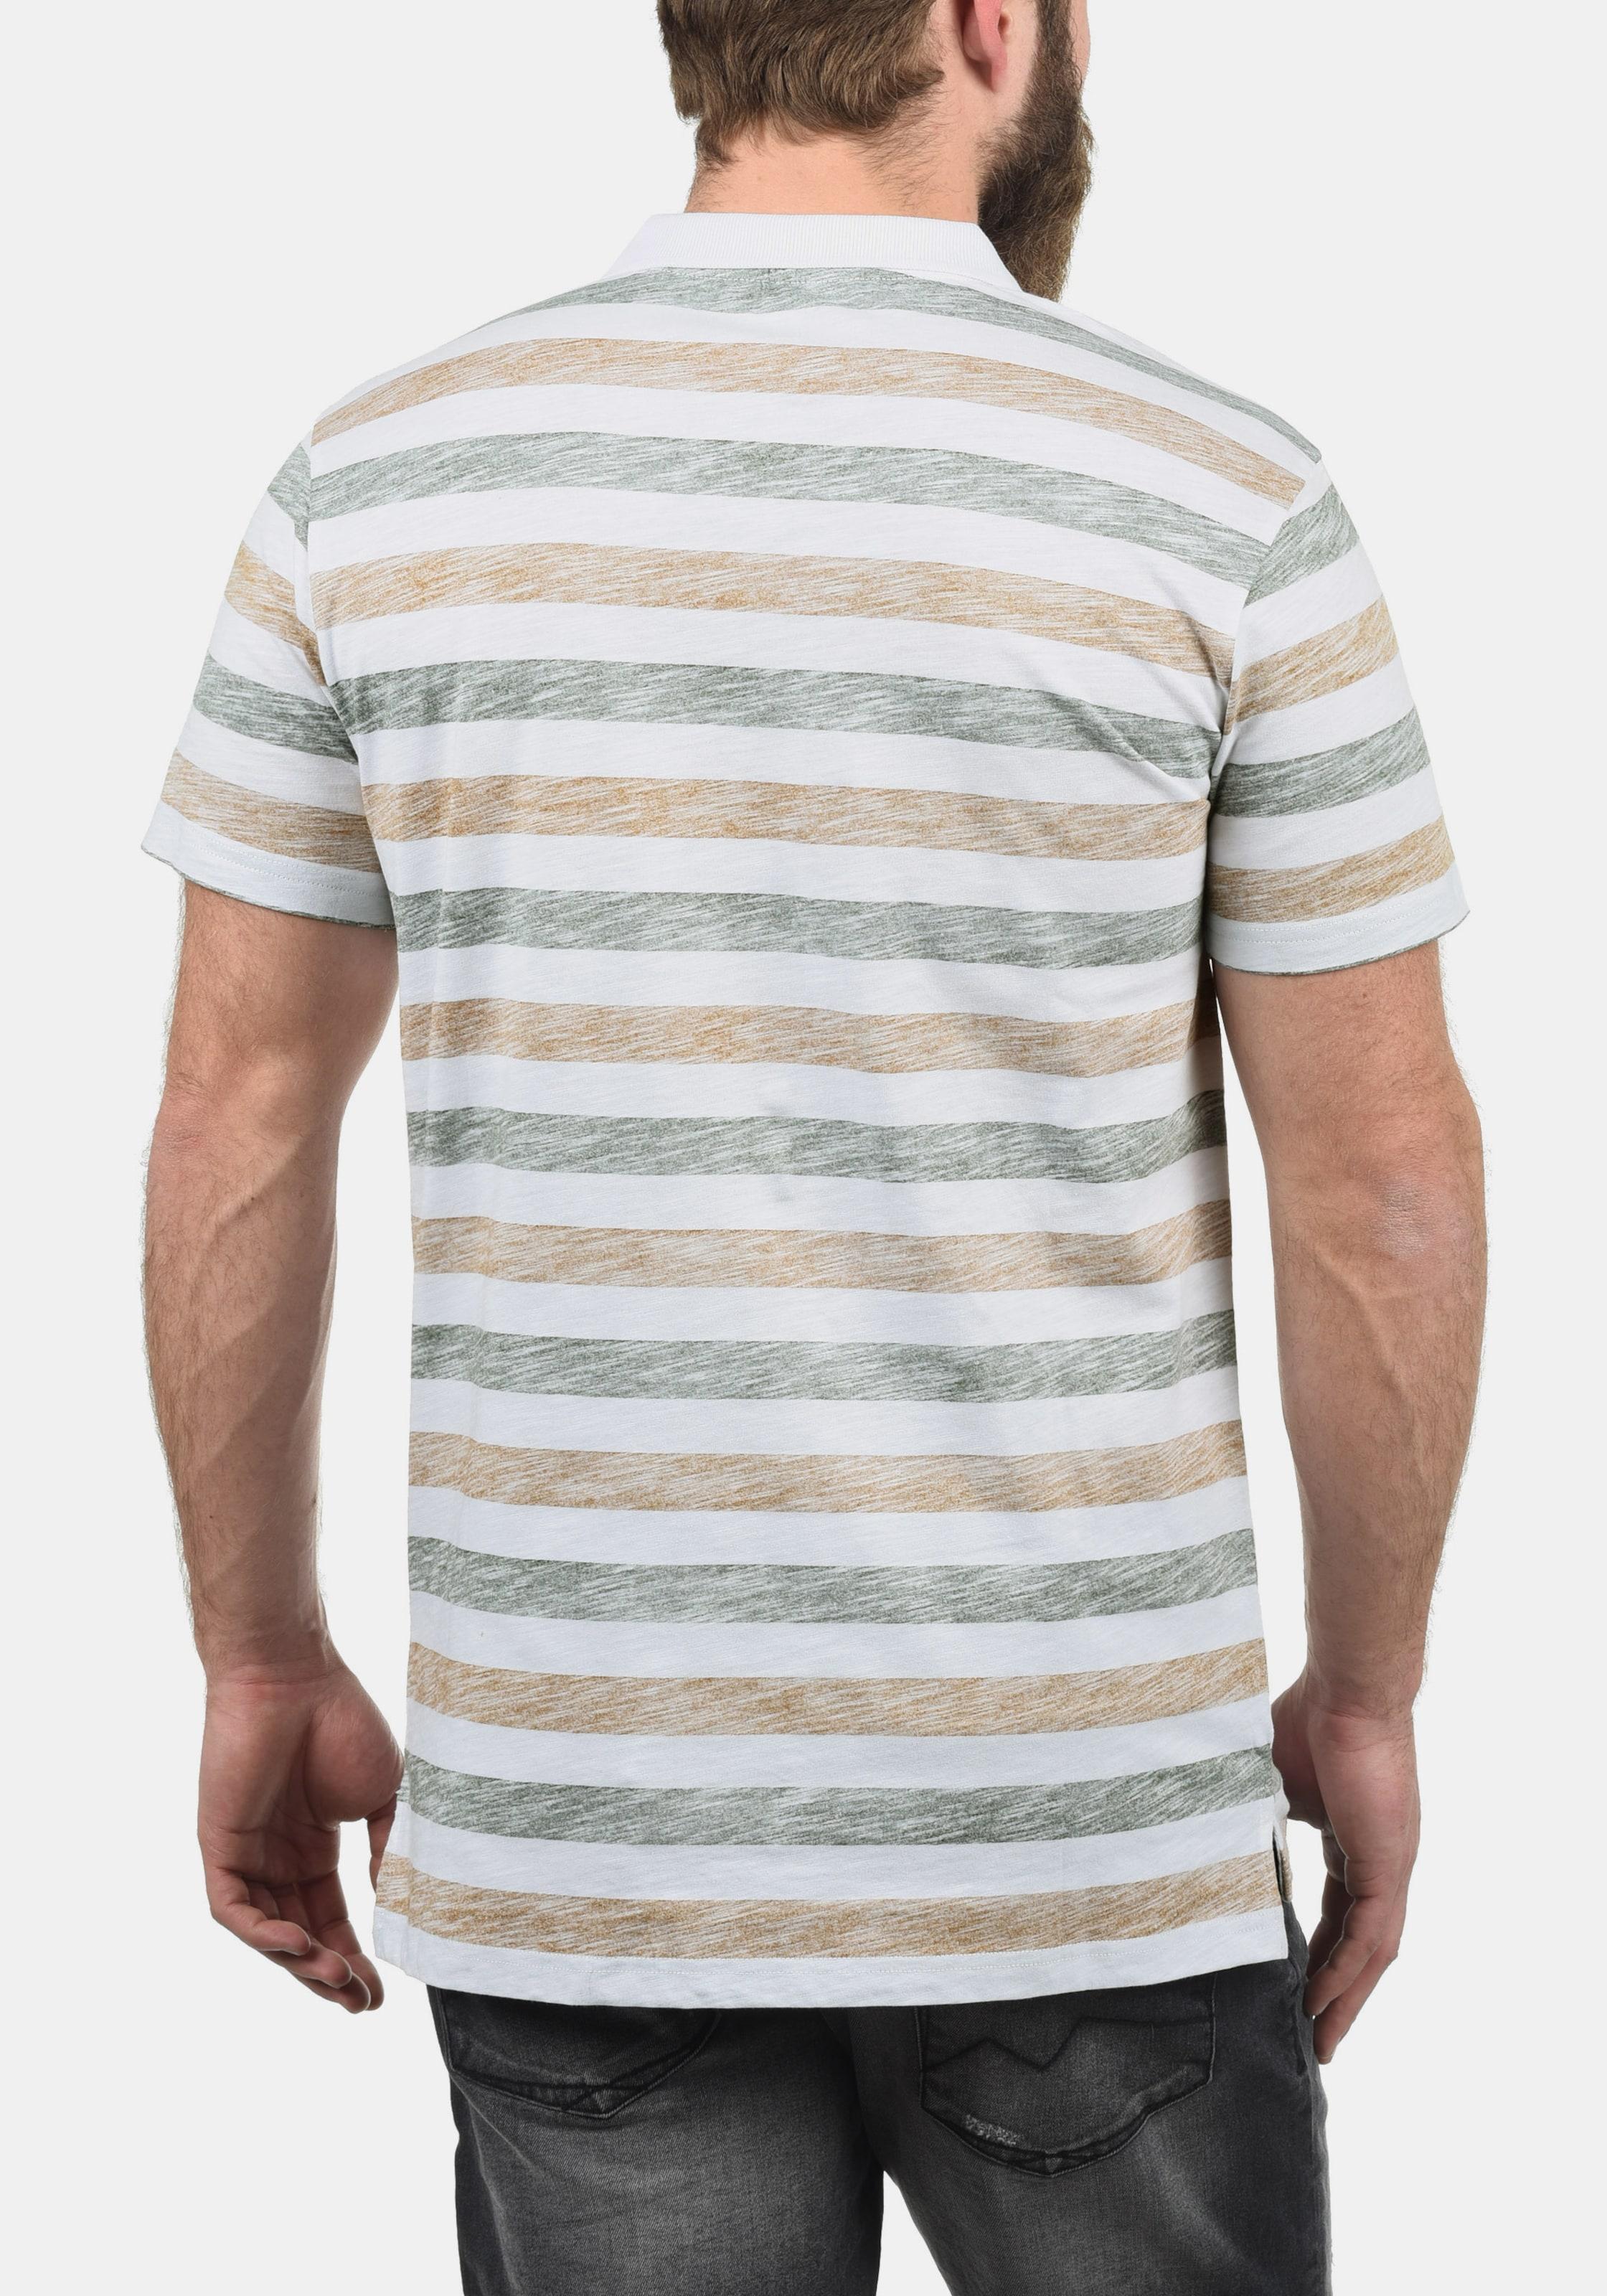 'teto' In Poloshirt Poloshirt 'teto' BraunWeiß BraunWeiß solid In solid 534RjLA